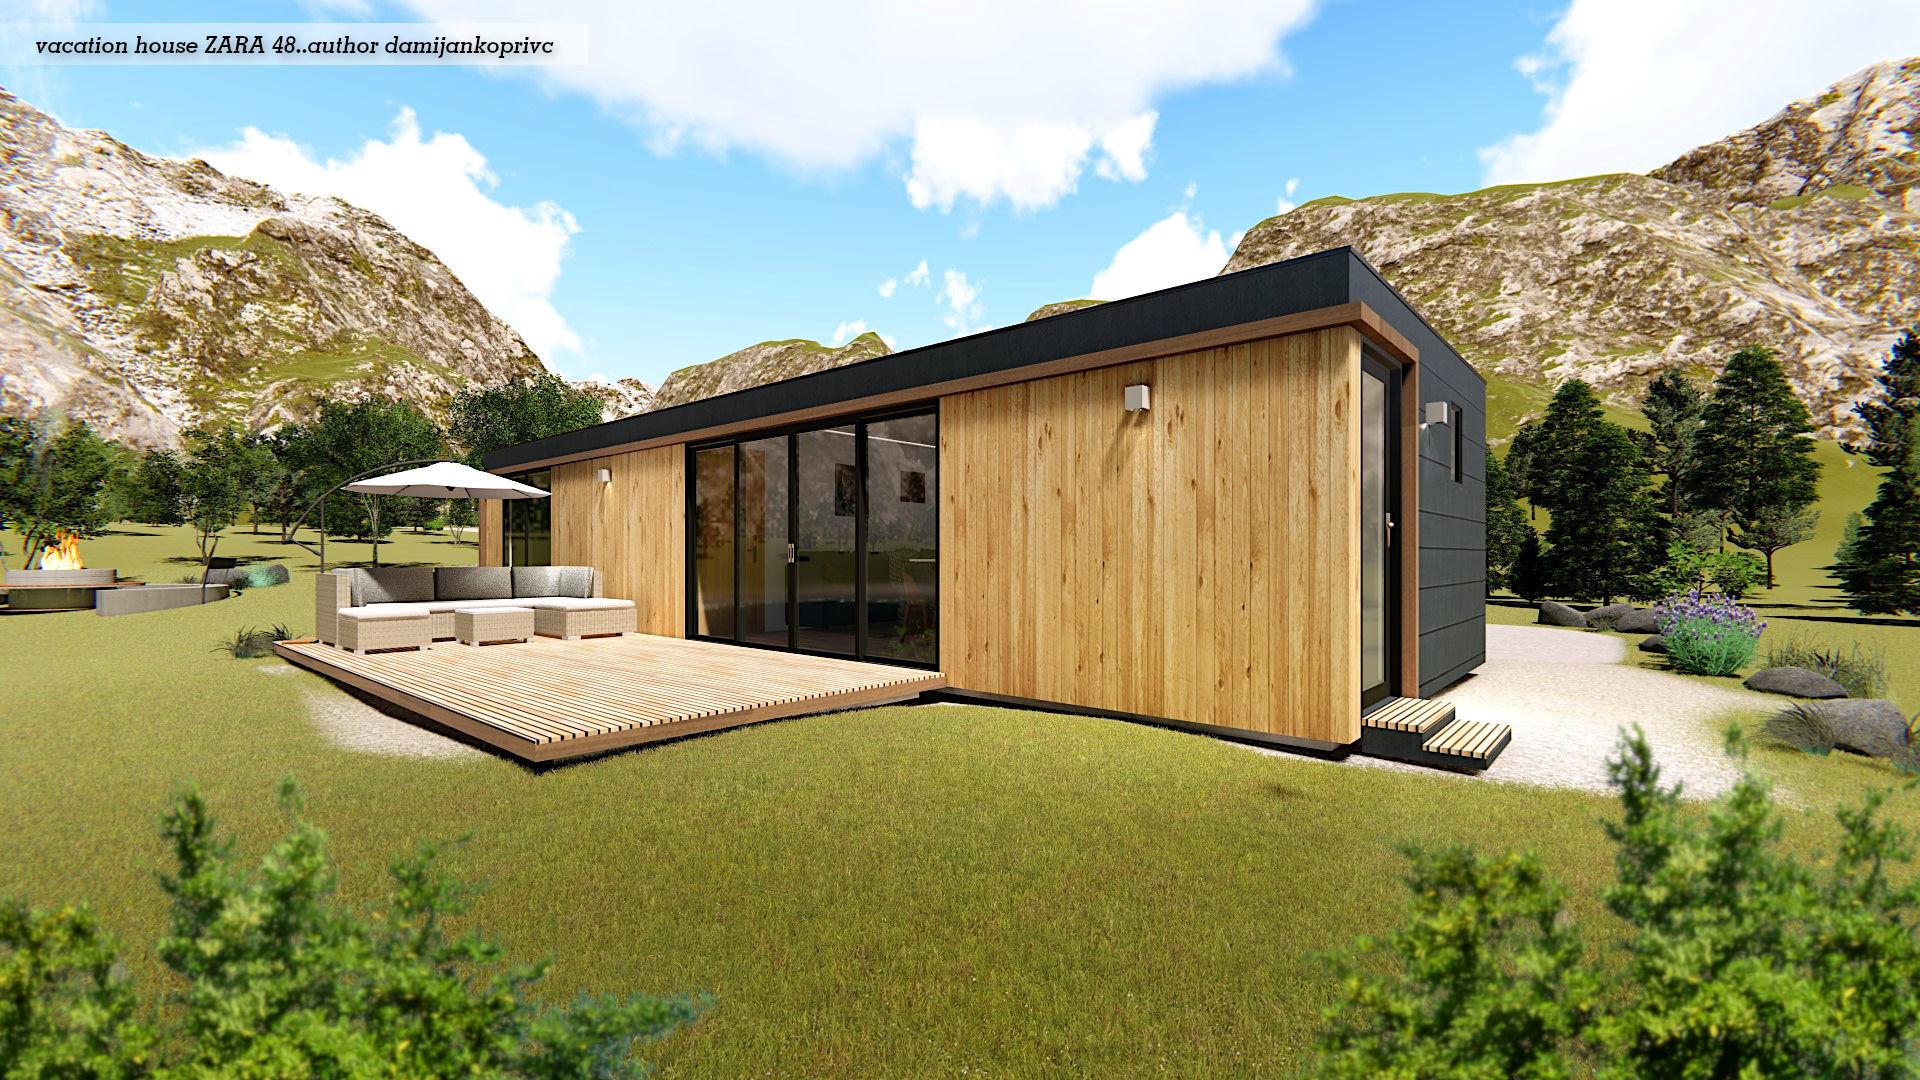 modern mobile home tiny house vacation house  ZARA 48 on 48m2